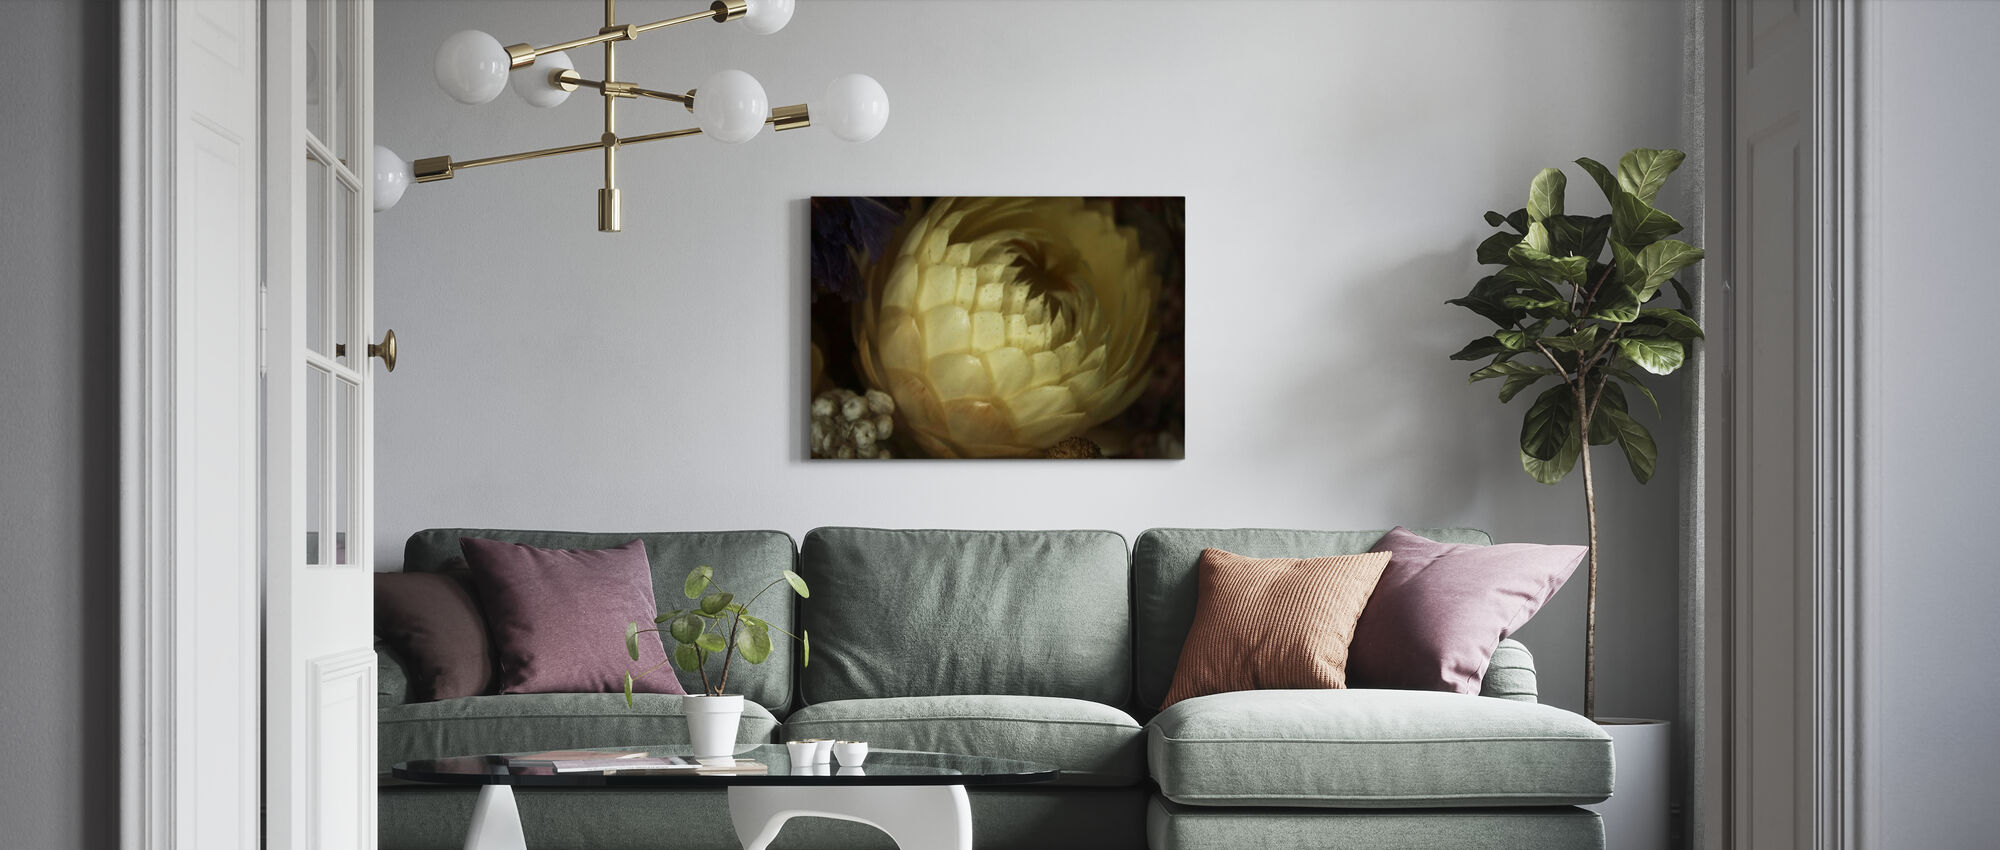 White of White - Canvas print - Living Room